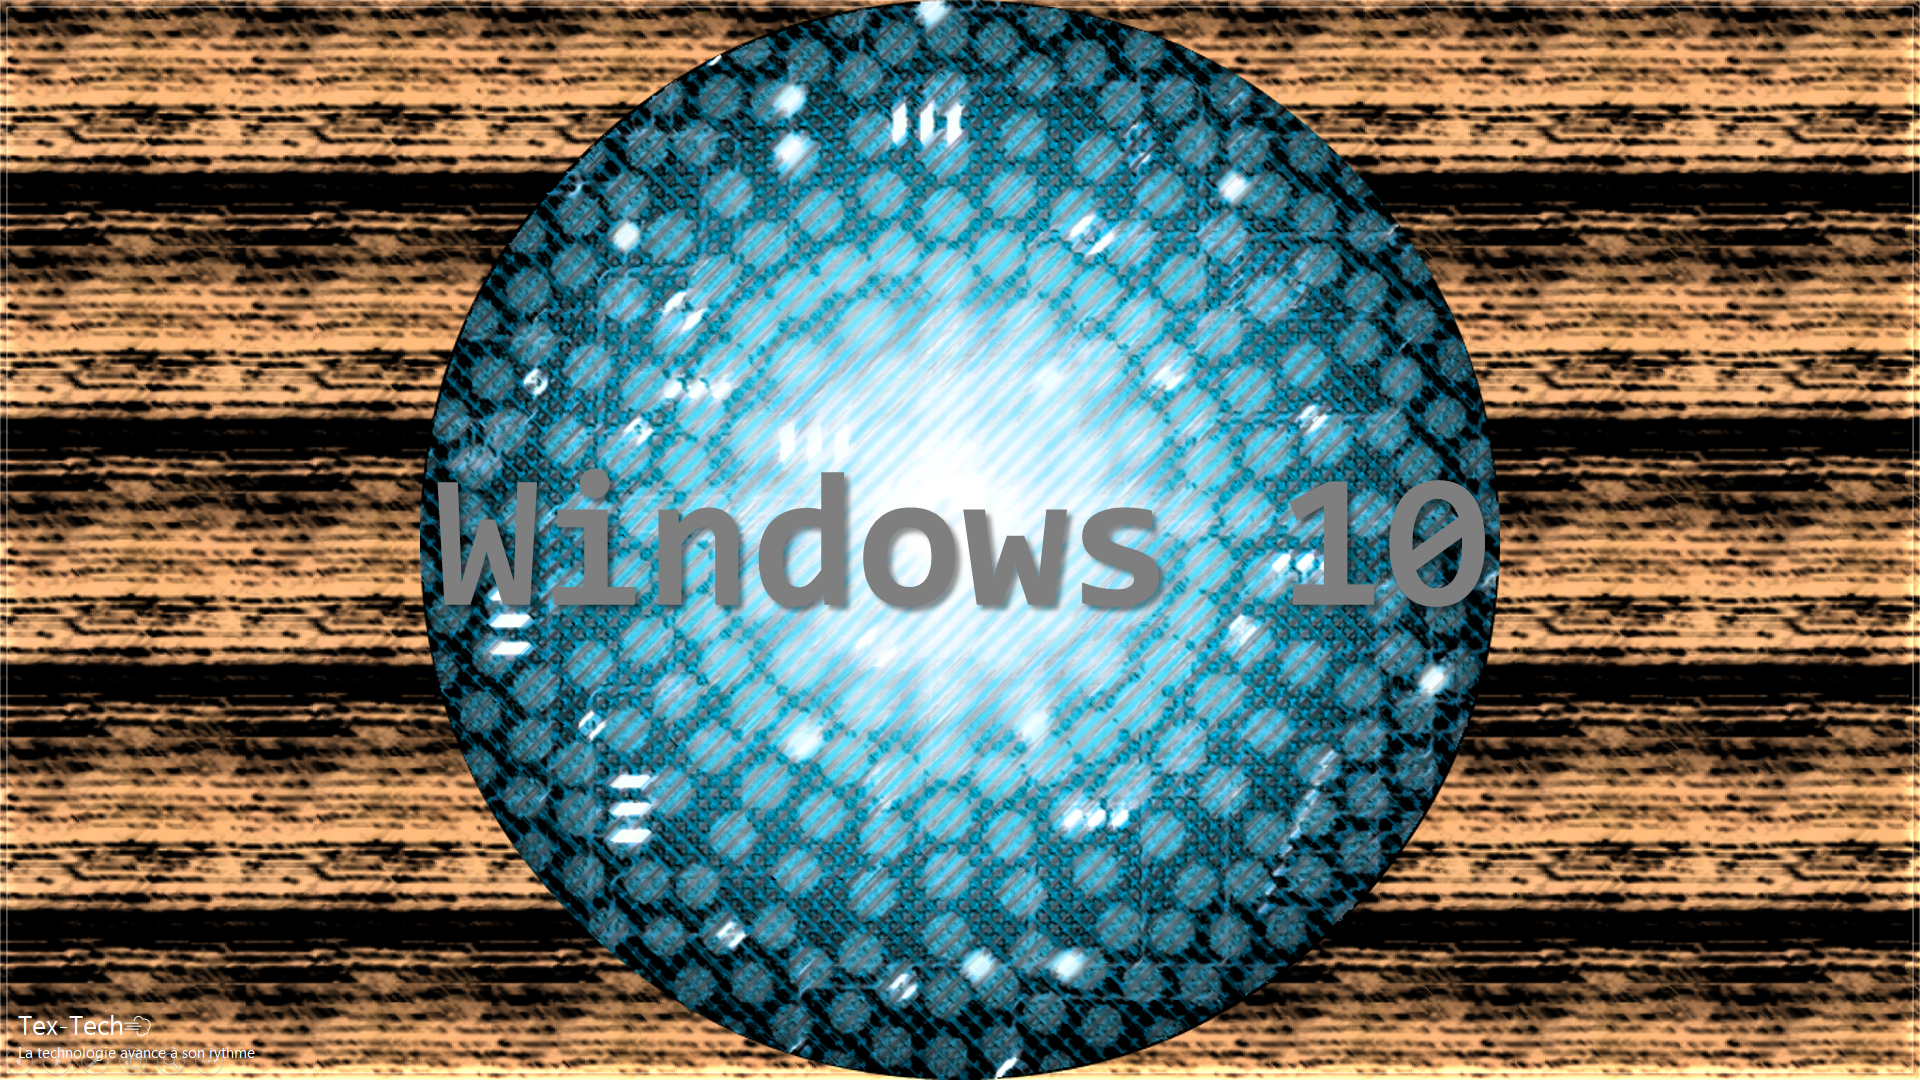 Fond d'écran Windows 10 n°3